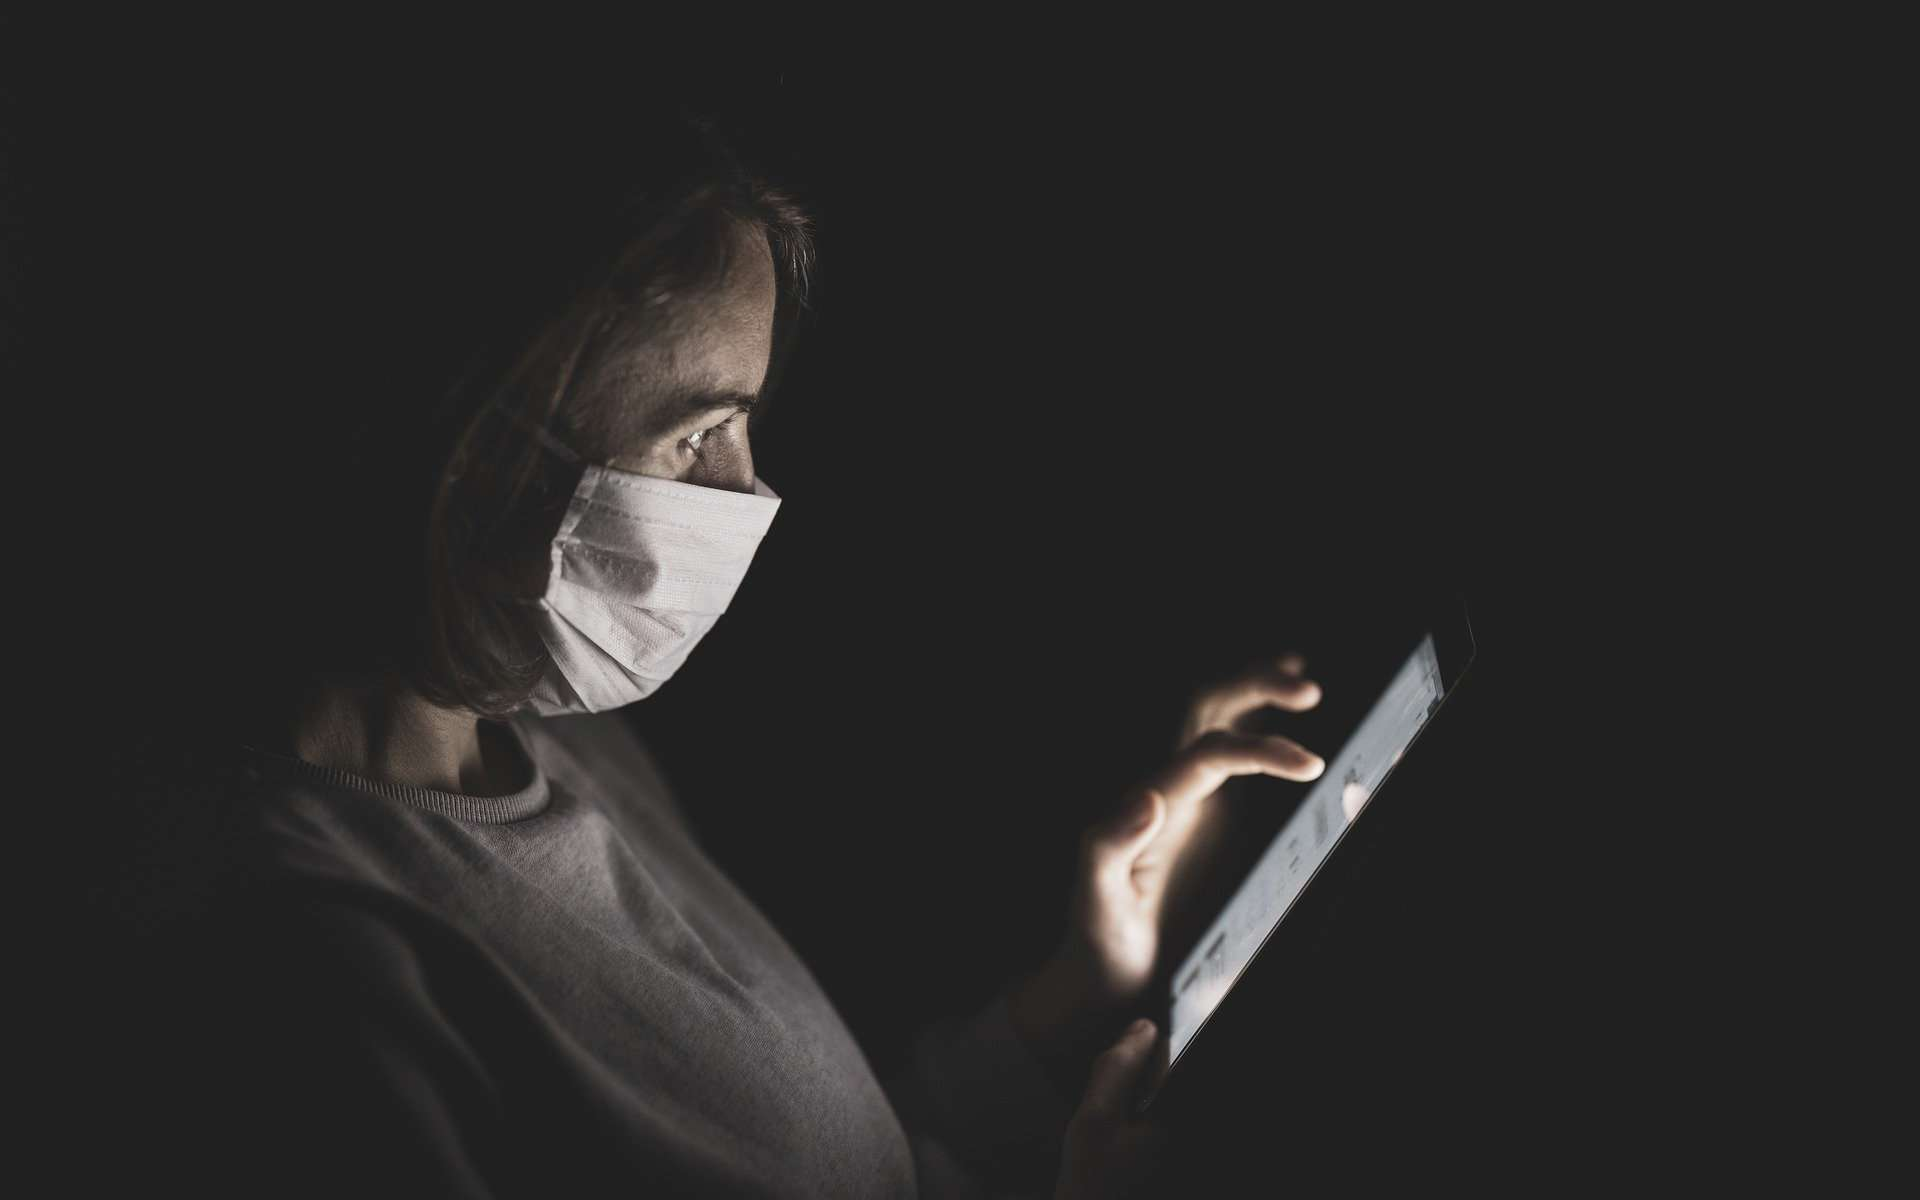 iOS 13.5 permettra d'envoyer automatiquement son dossier médical © Engin Akyurt / Pixabay